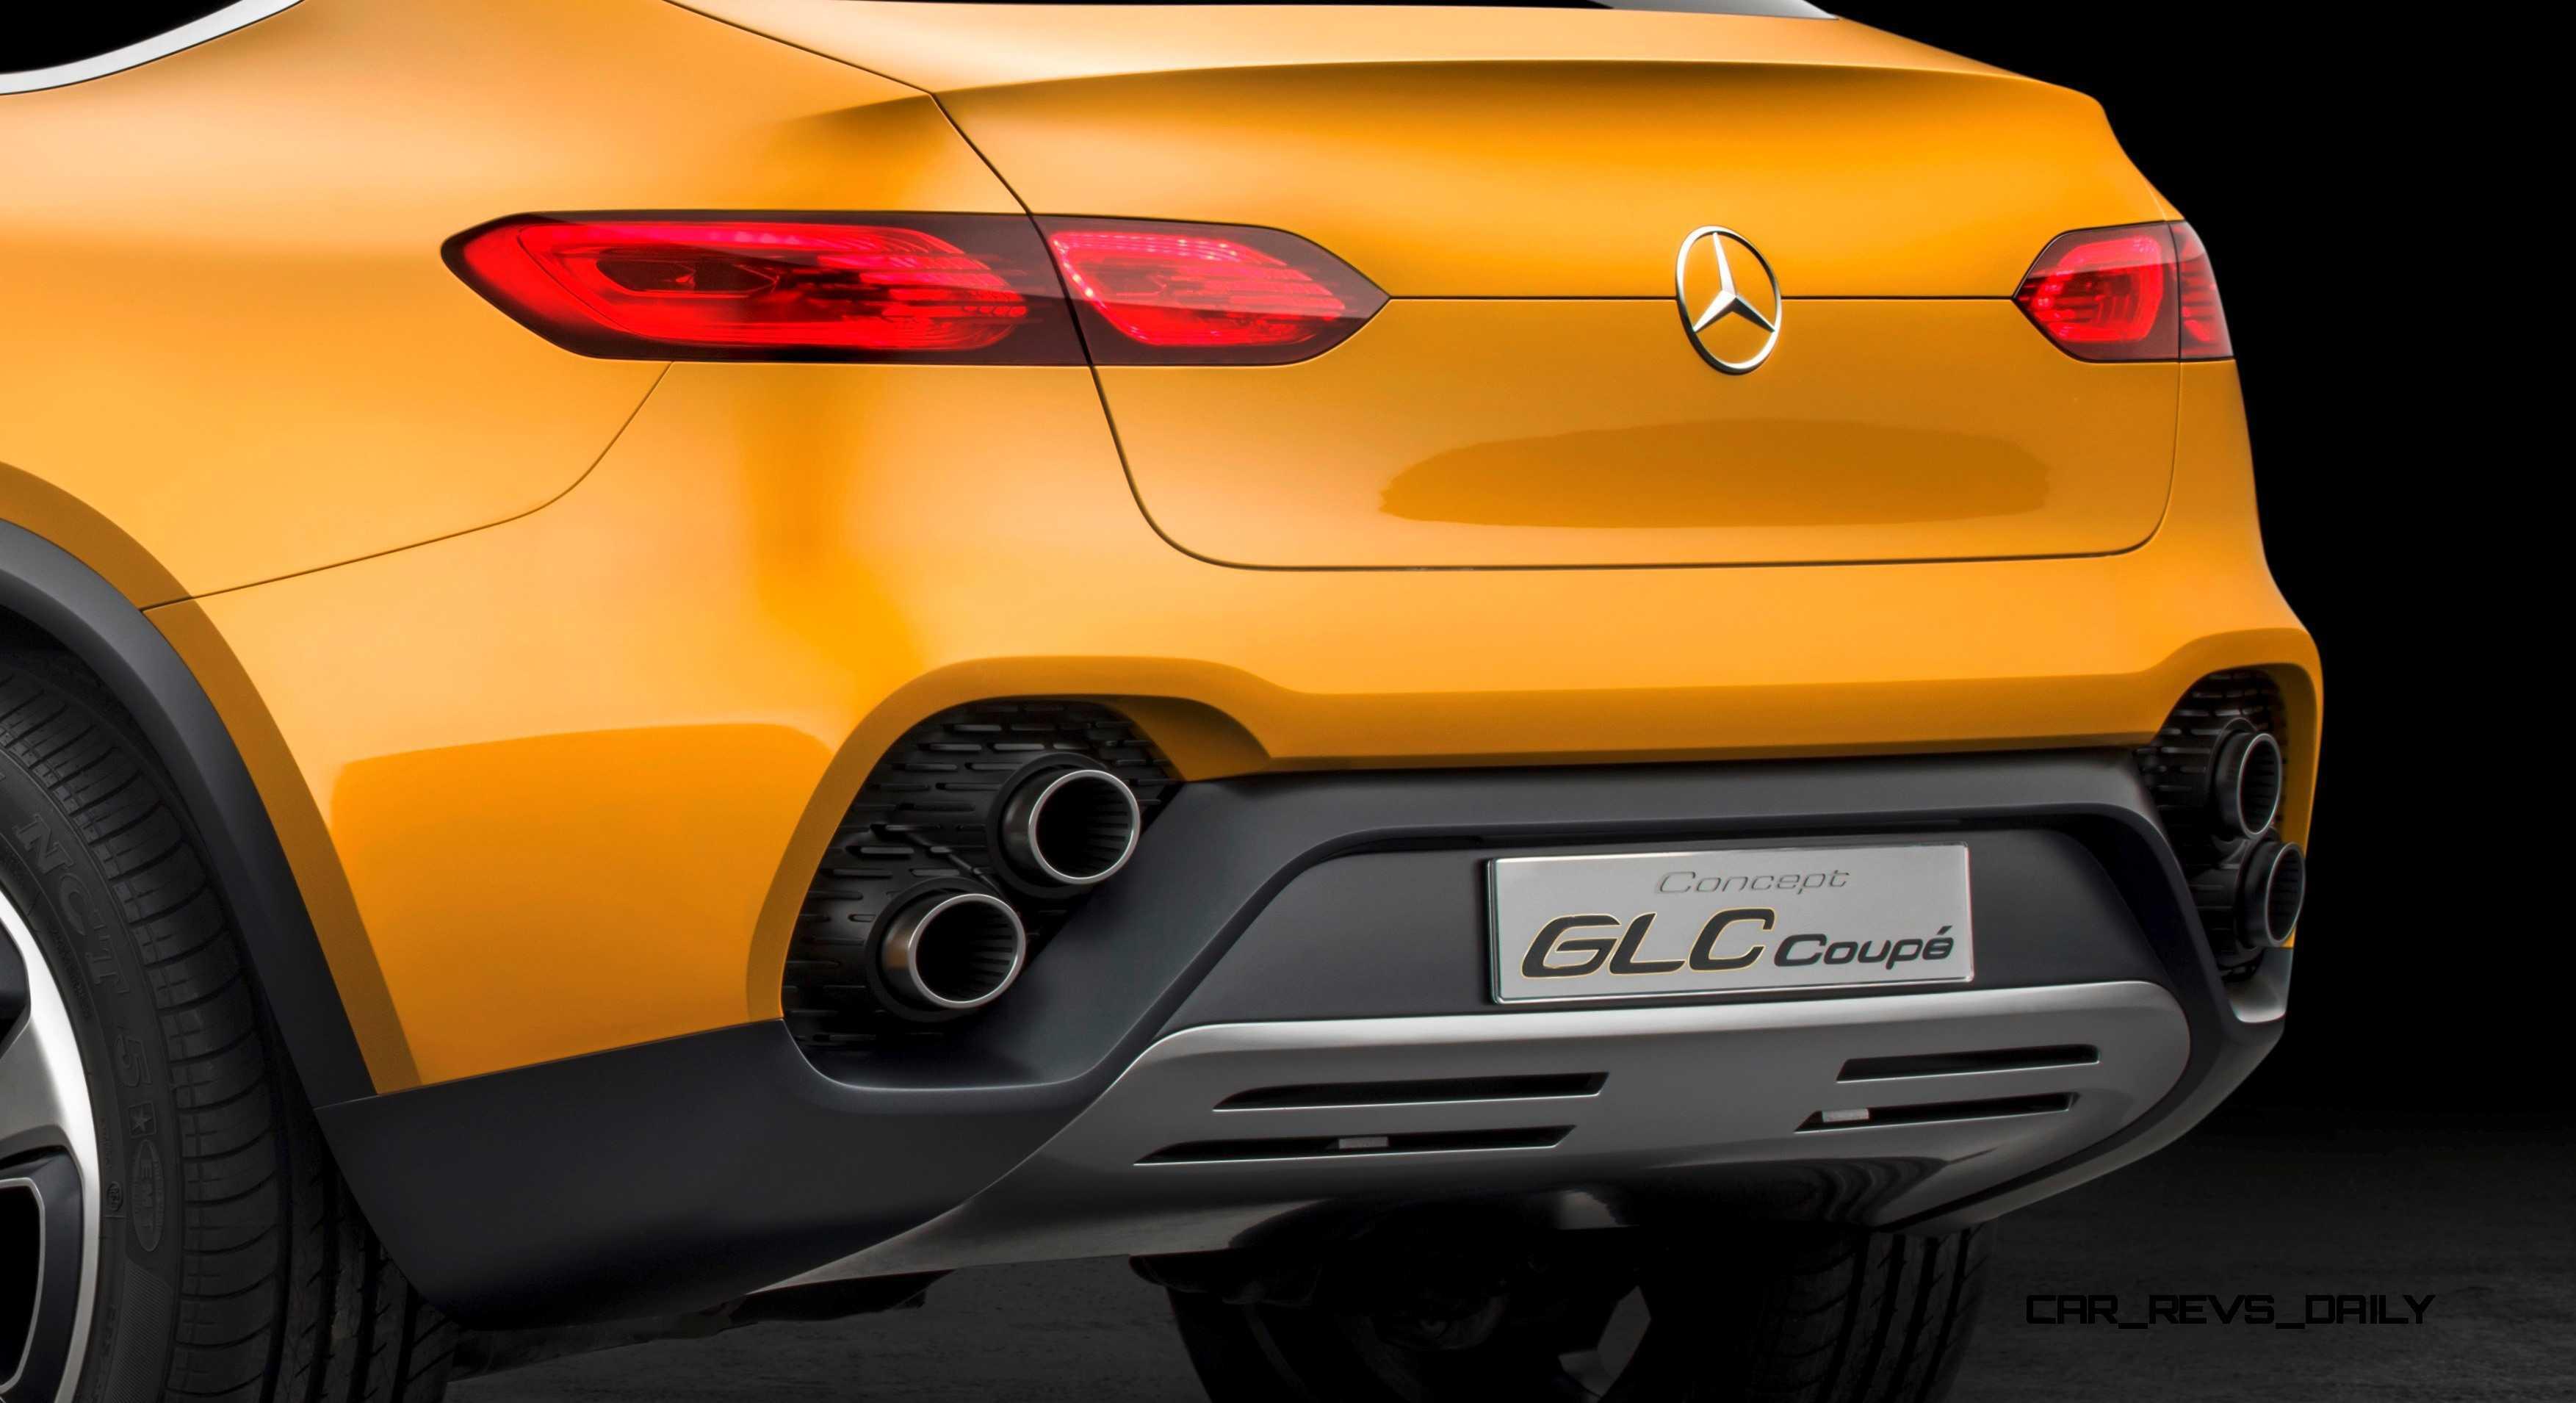 Preview Mercedes Benz Concept GLC Coupé Shanghai 2015